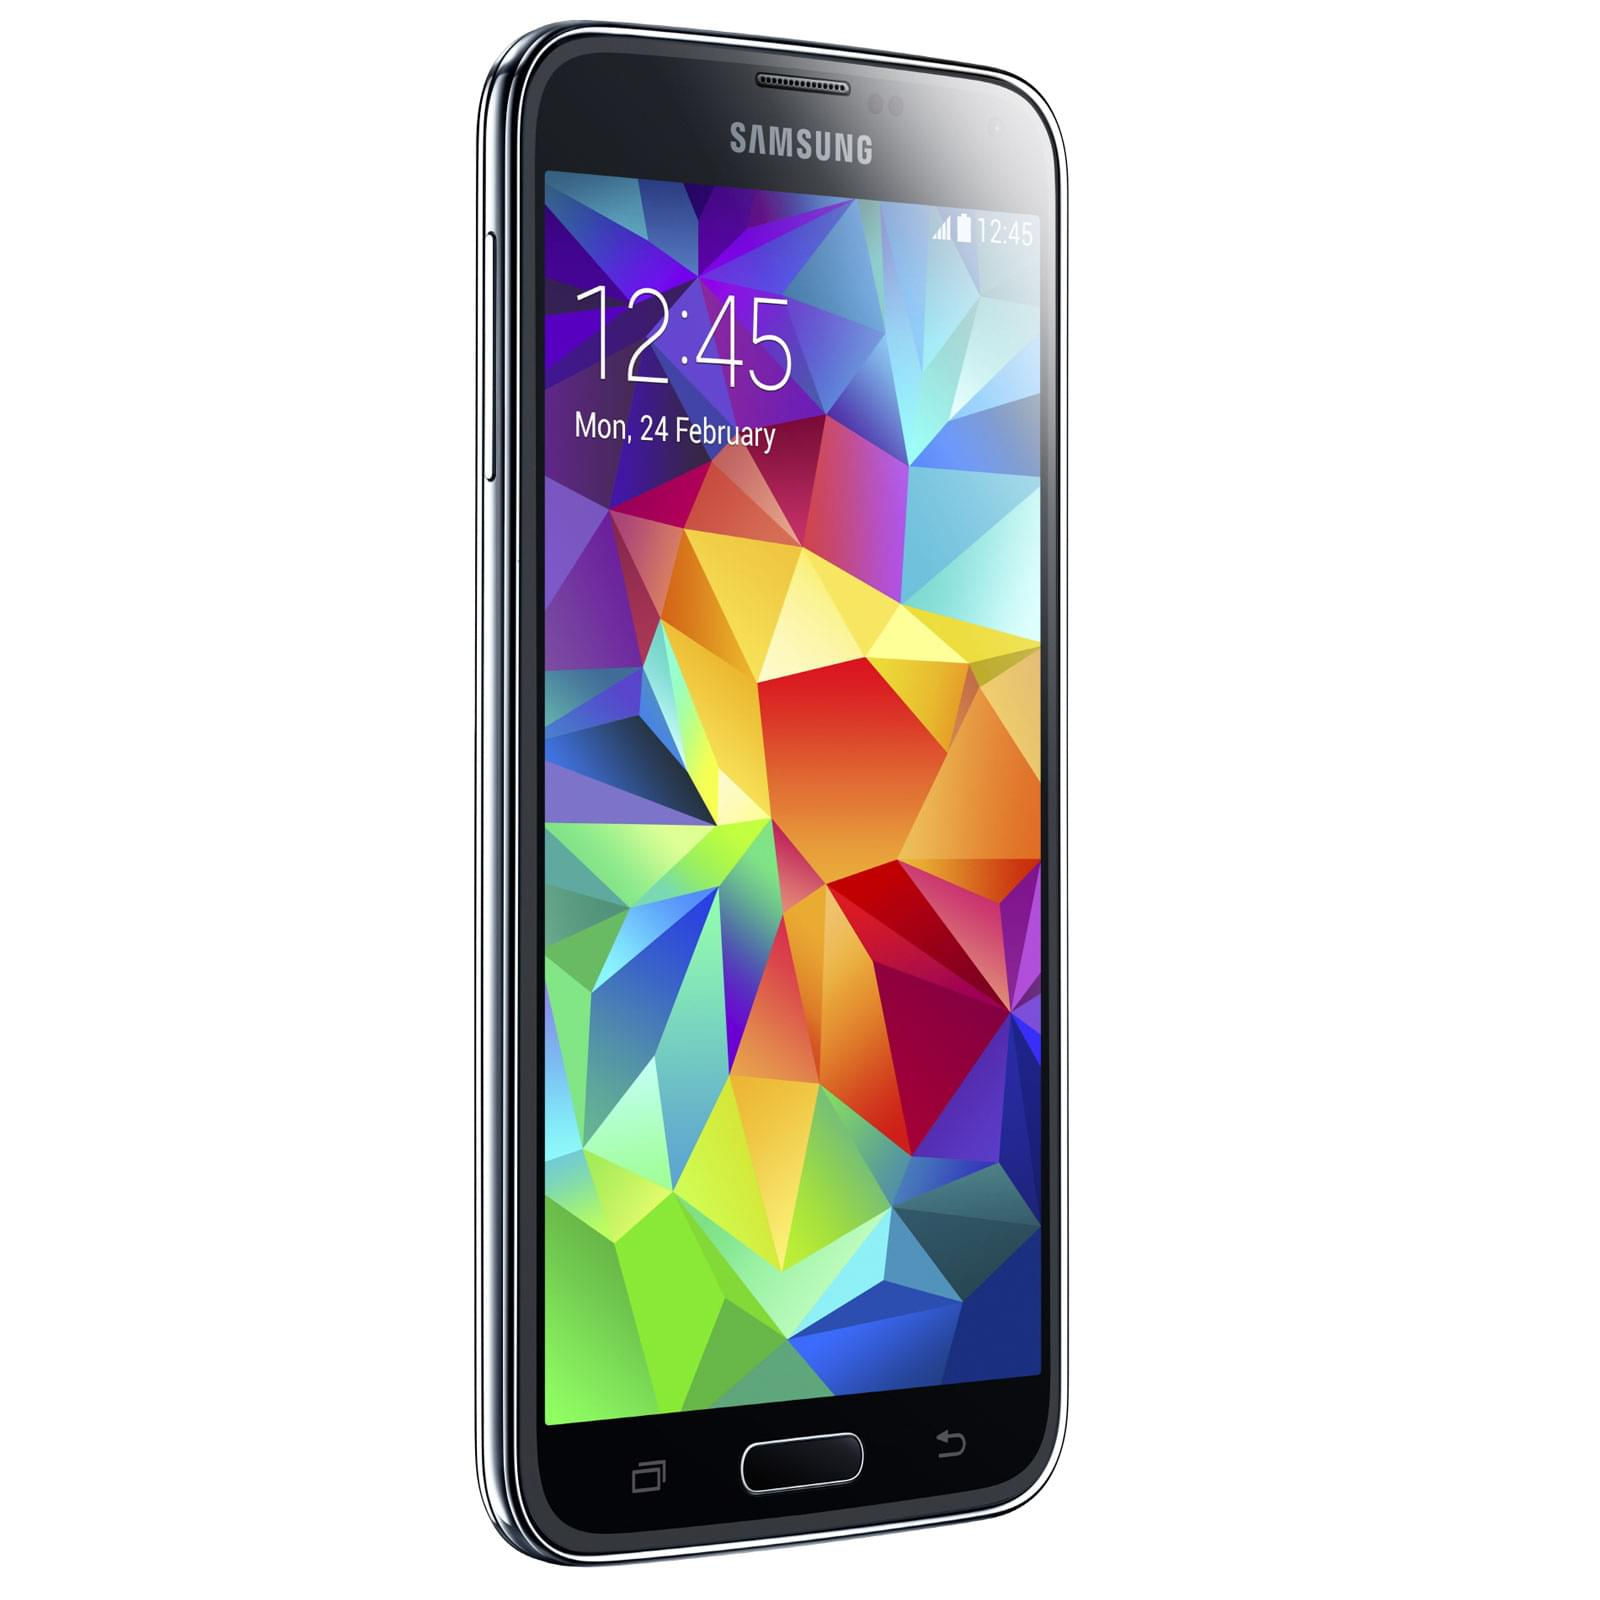 Samsung Galaxy S5 16Go Bleu G900F - Téléphonie Samsung - 0